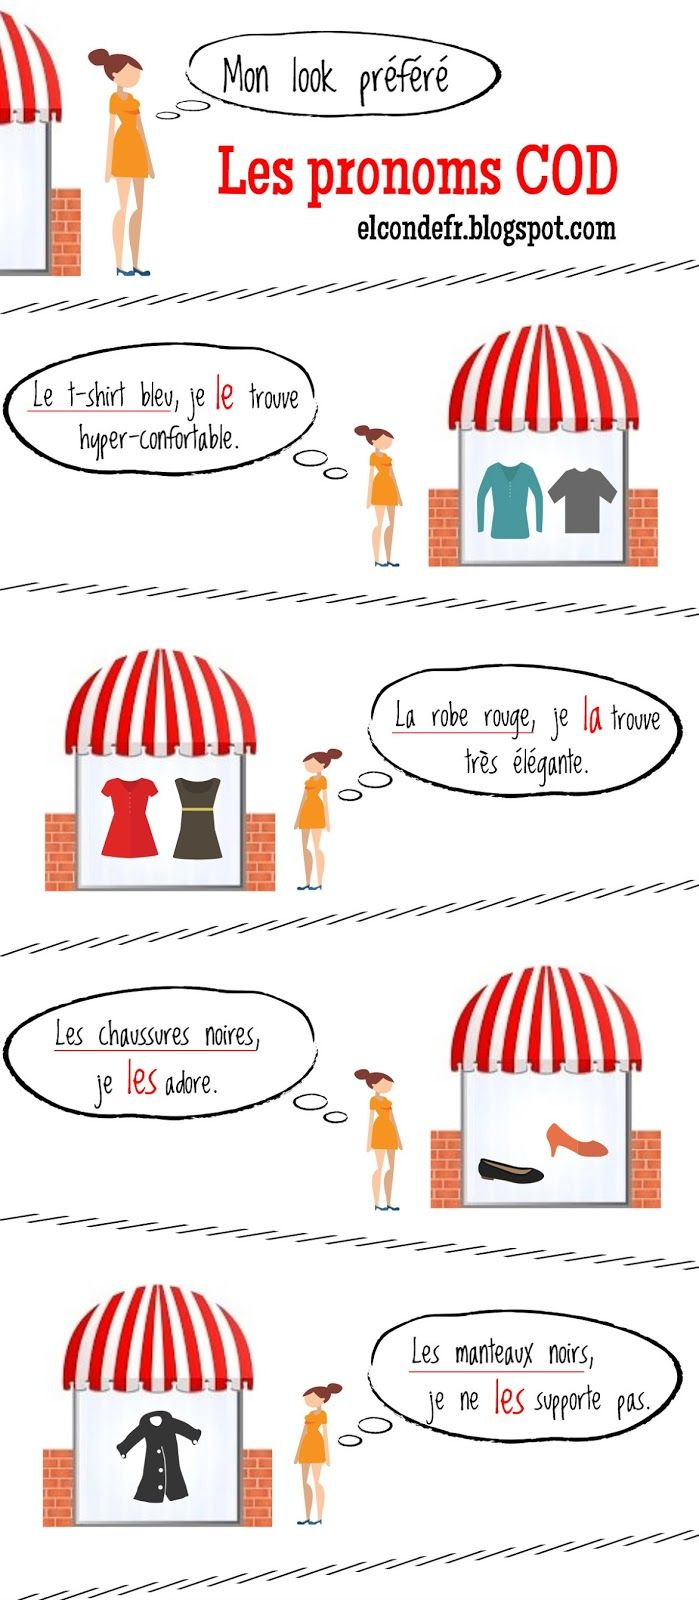 El Conde. fr: Comment utiliser les pronoms complément d'objet di...